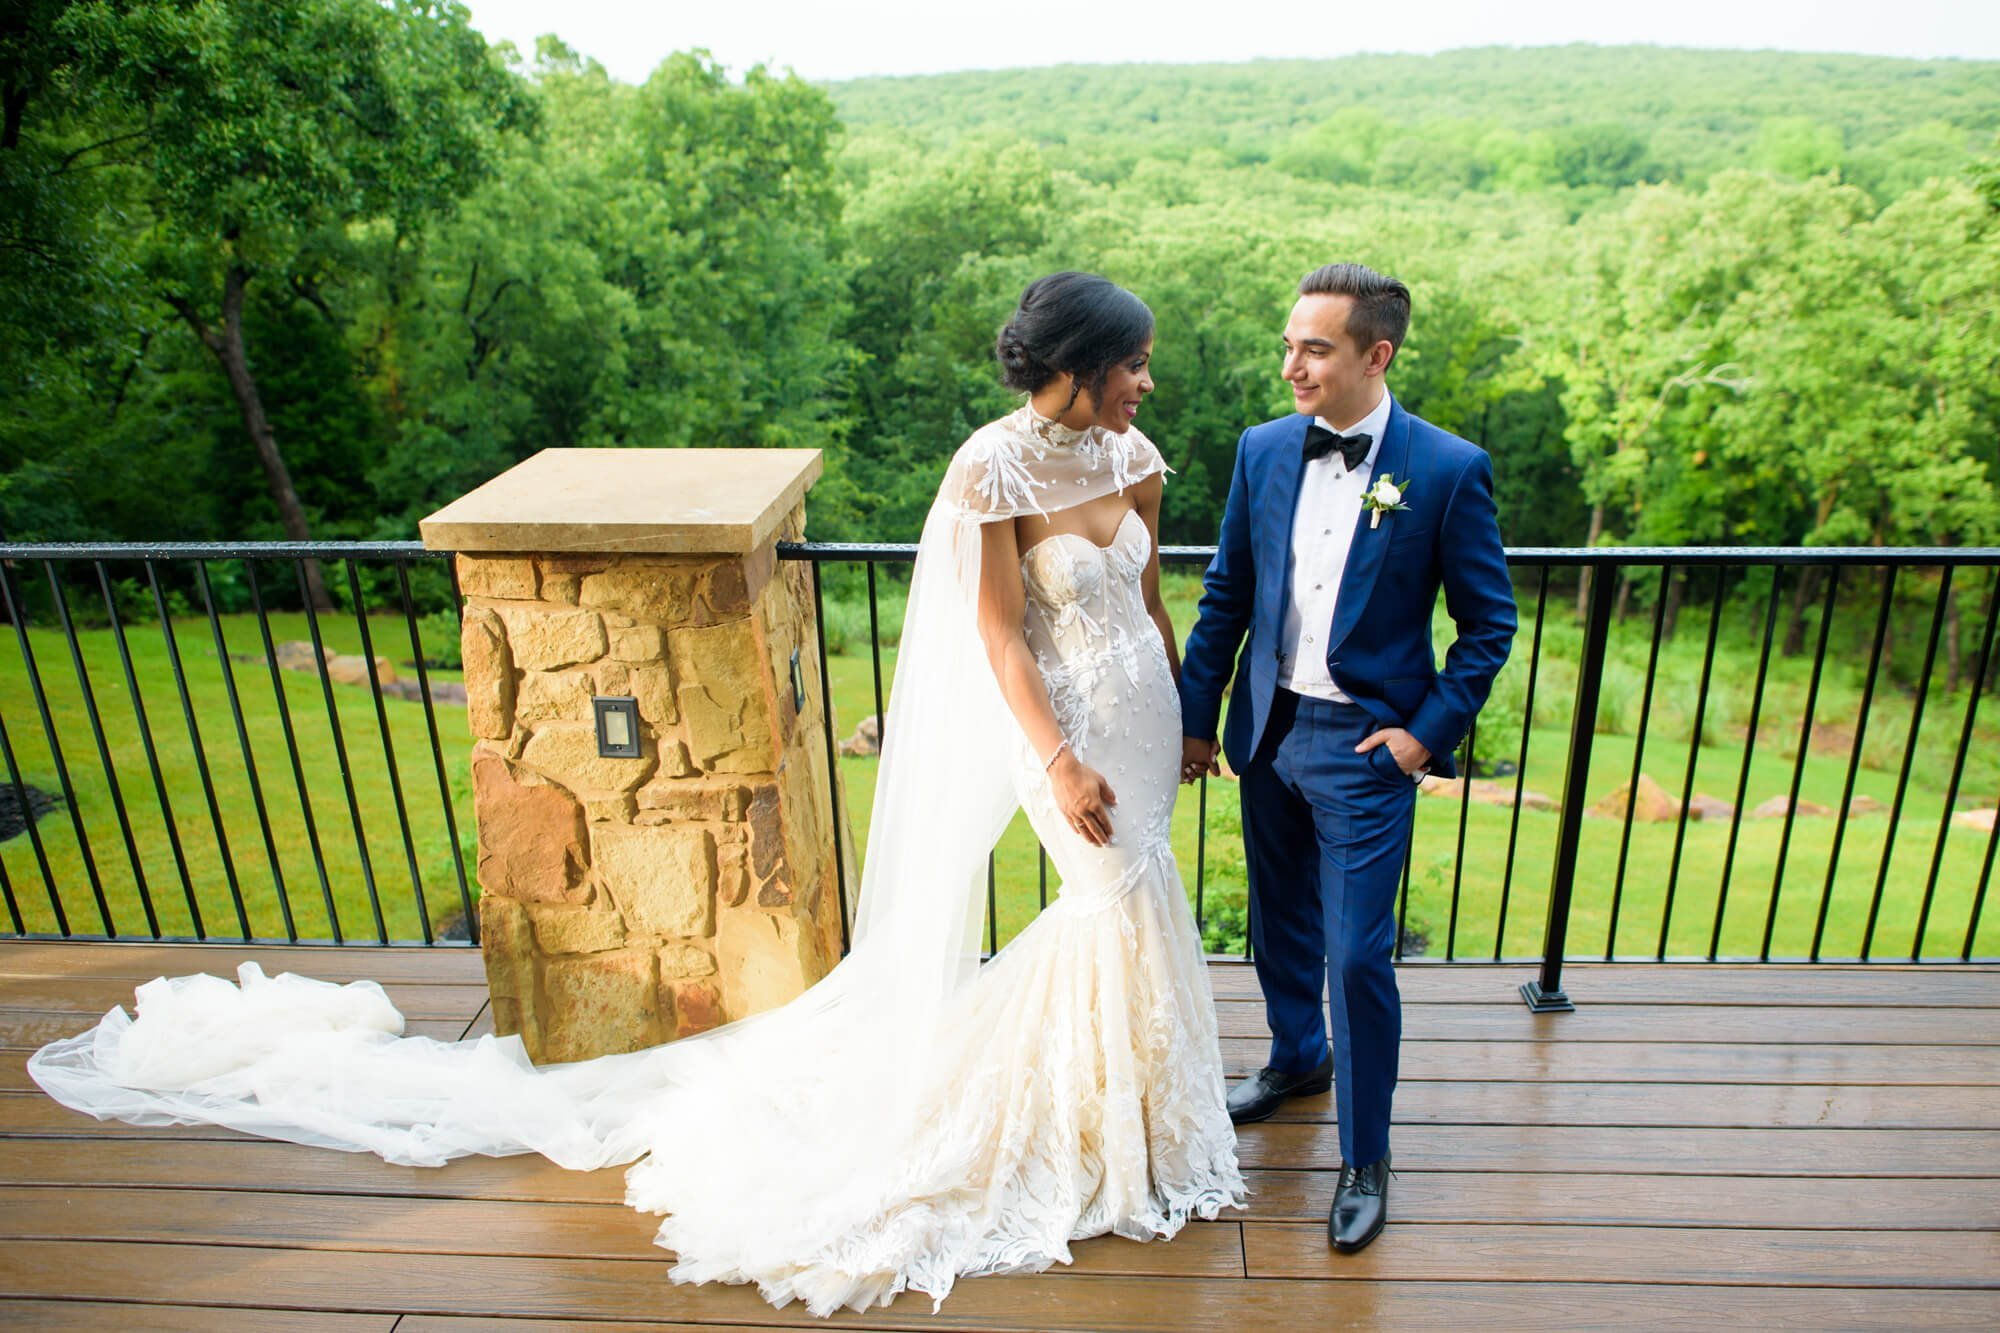 Baker Wedding - Jeremy Mennerick Photo - Couple